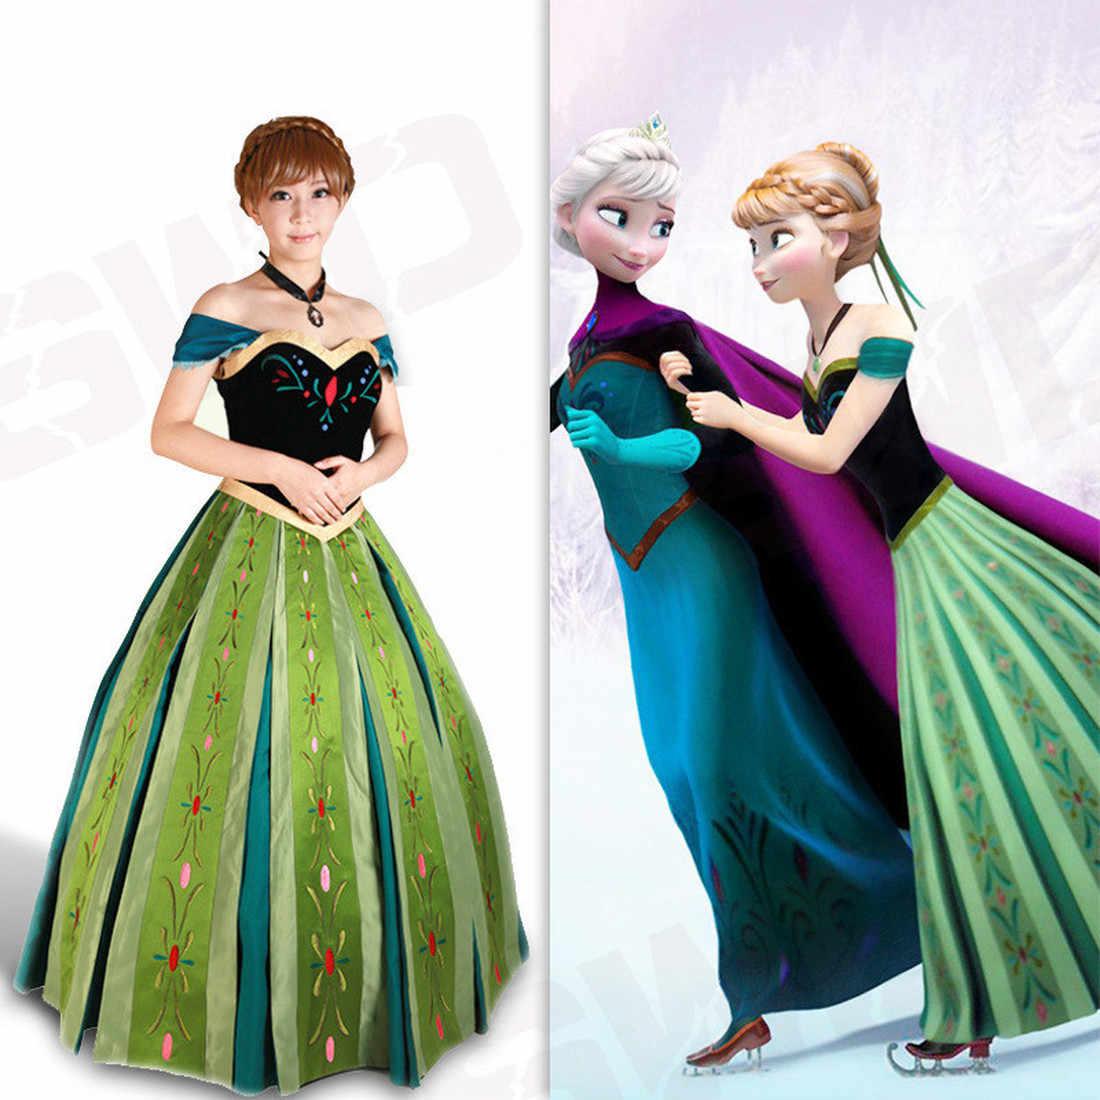 Carnaval de luxo elsa & anna aniversário moda gelo neve rainha festa traje cosplay vestido adulto senhora cinderela neve branca princesa